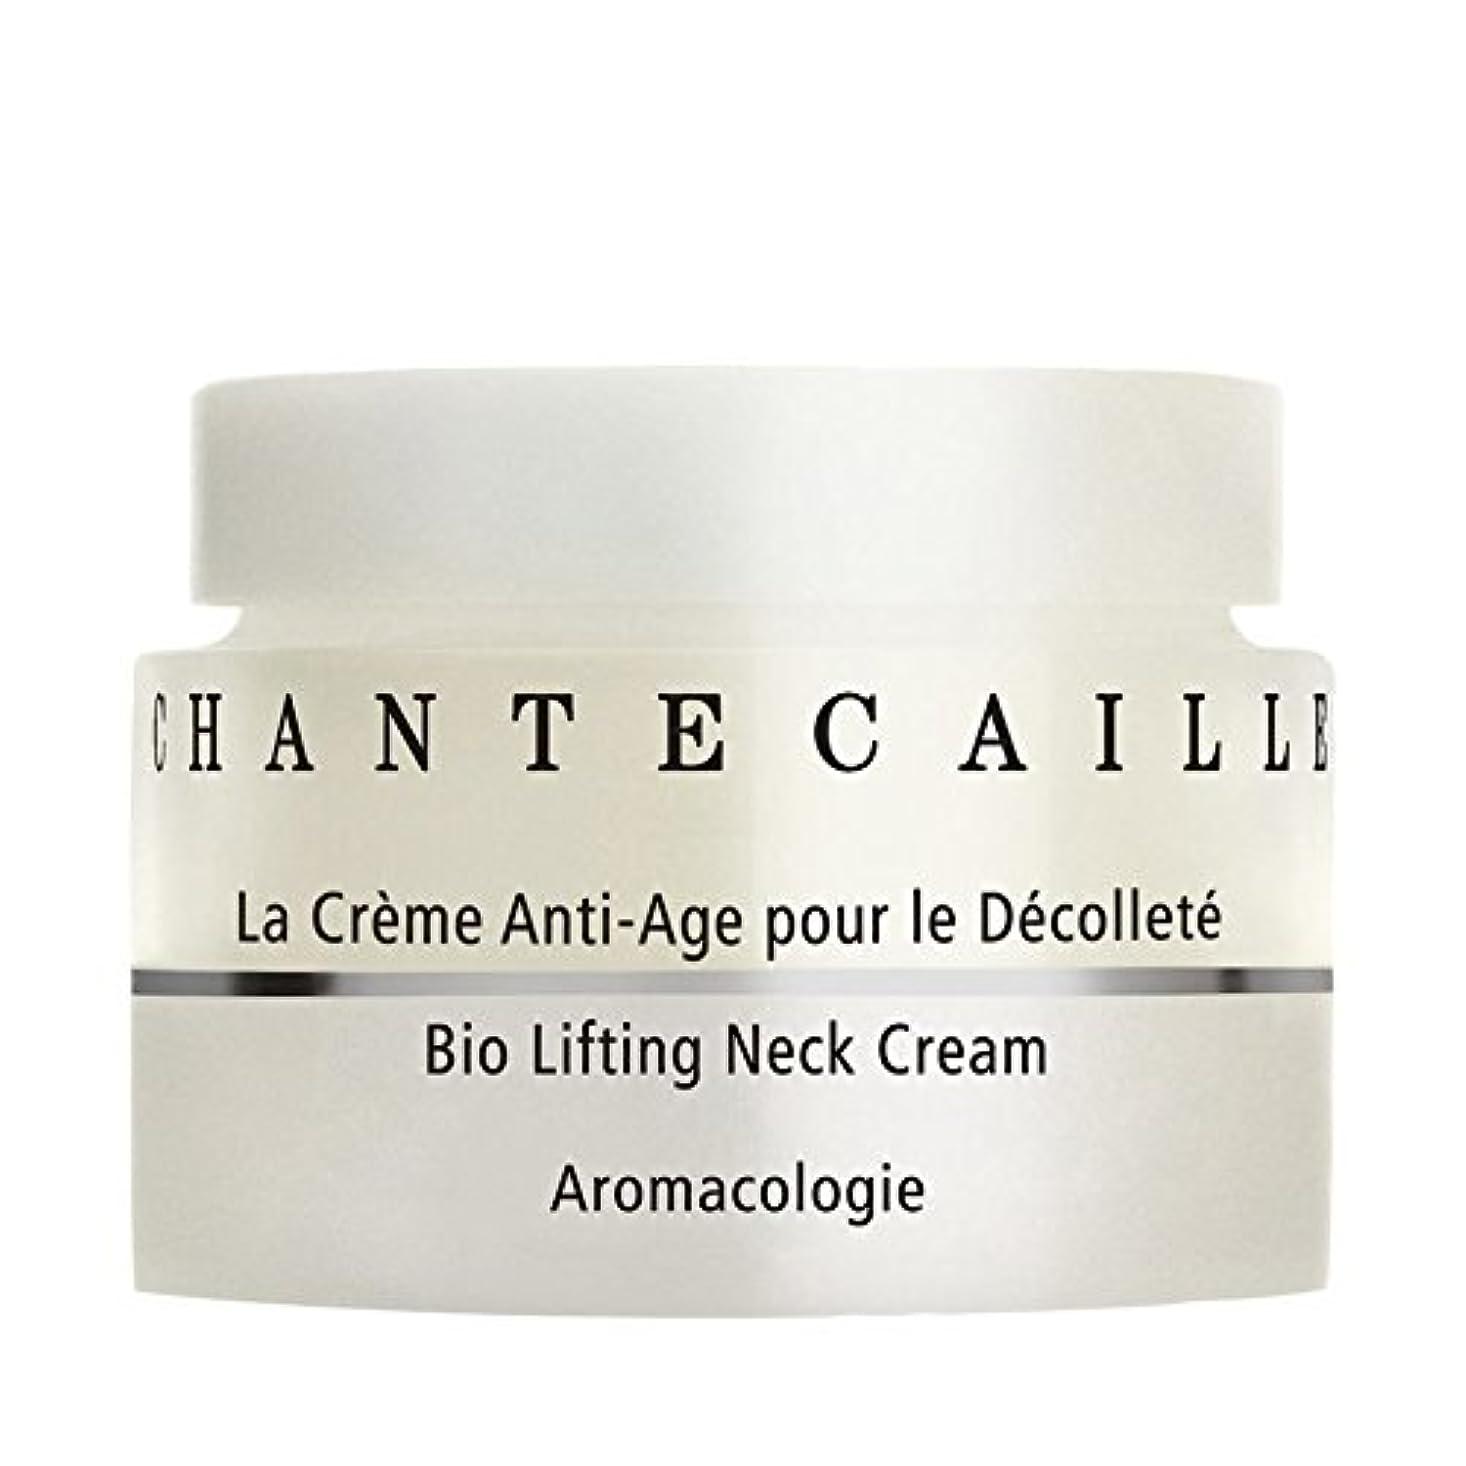 Chantecaille Biodynamic Lifting Neck Cream, Chantecaille (Pack of 6) - シャンテカイユバイオダイナミックリフティングネッククリーム、シャンテカイユ x6...